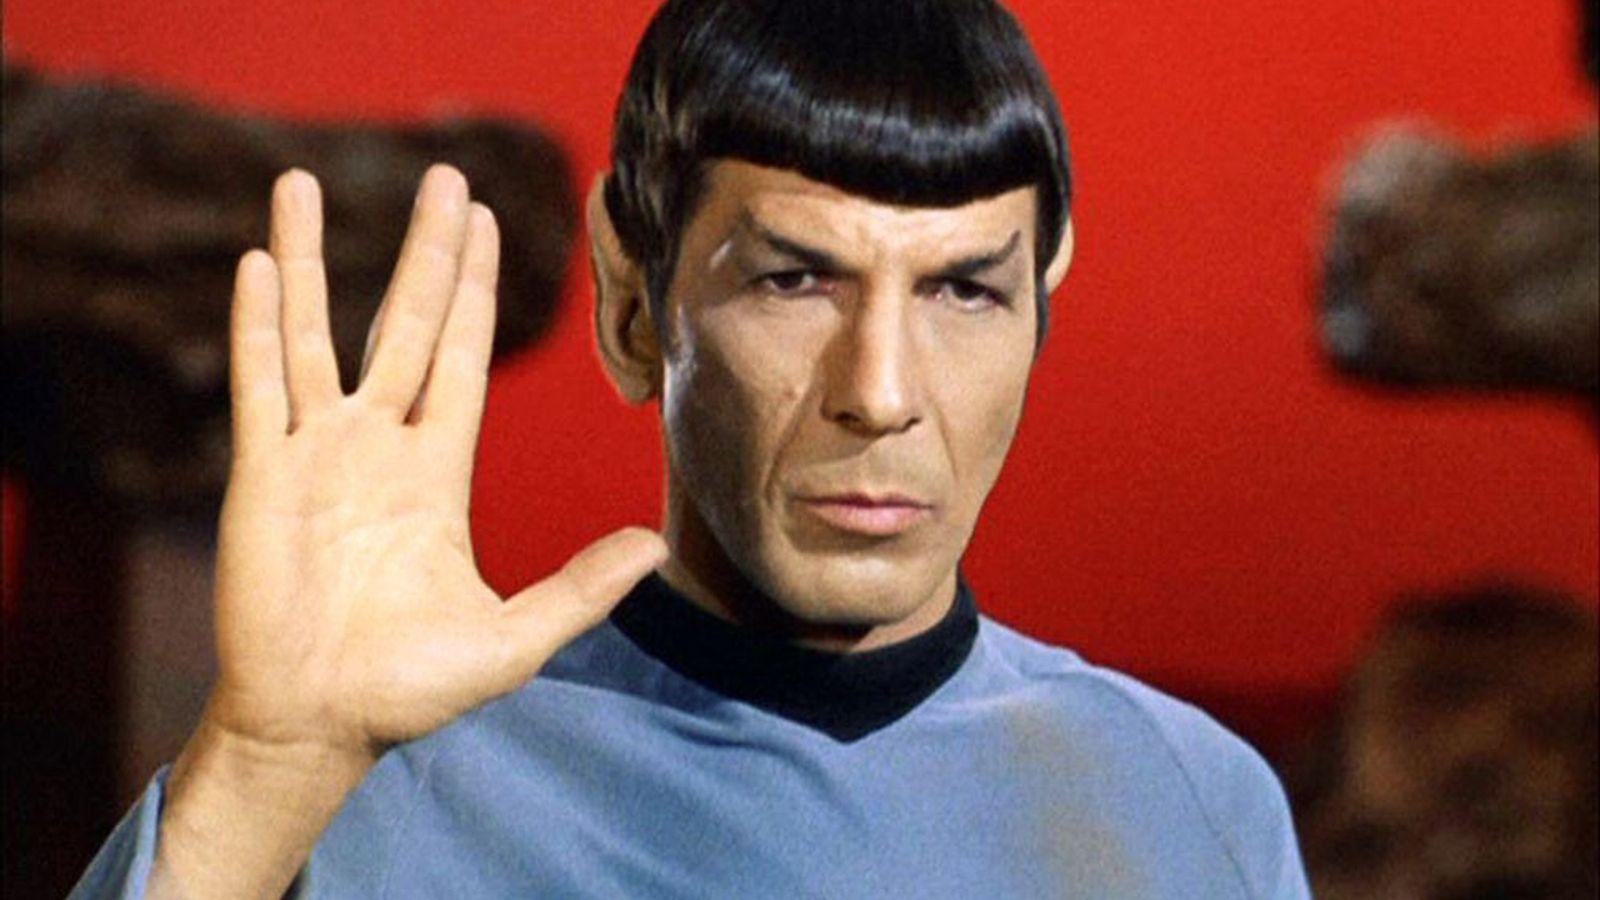 Actor Leonard Nimoy originated the Vulcan salute on the 1960s television series Star Trek.